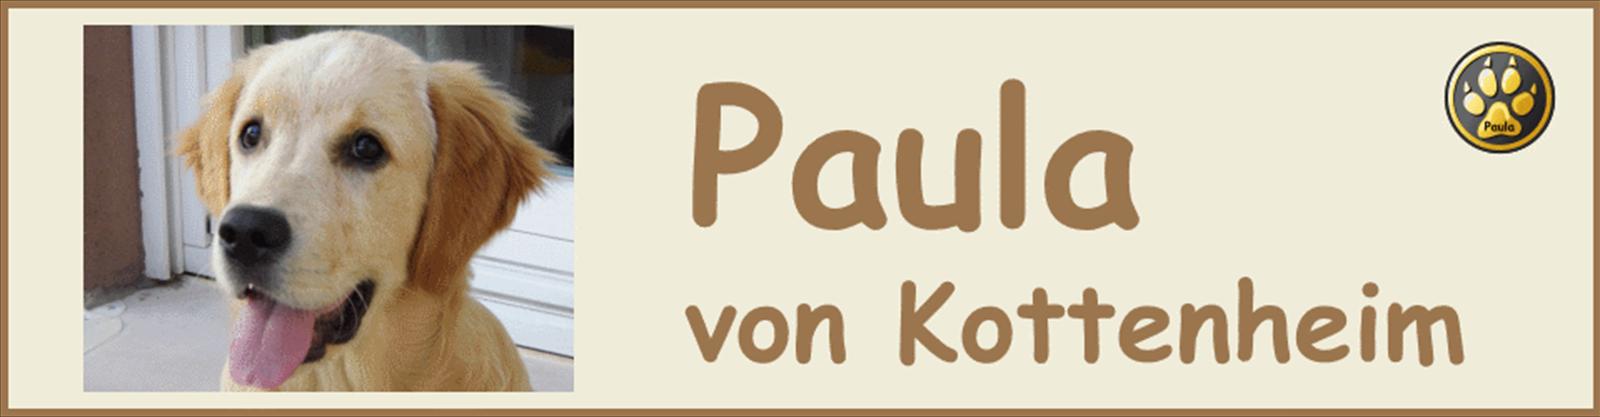 Paula-Banner-03